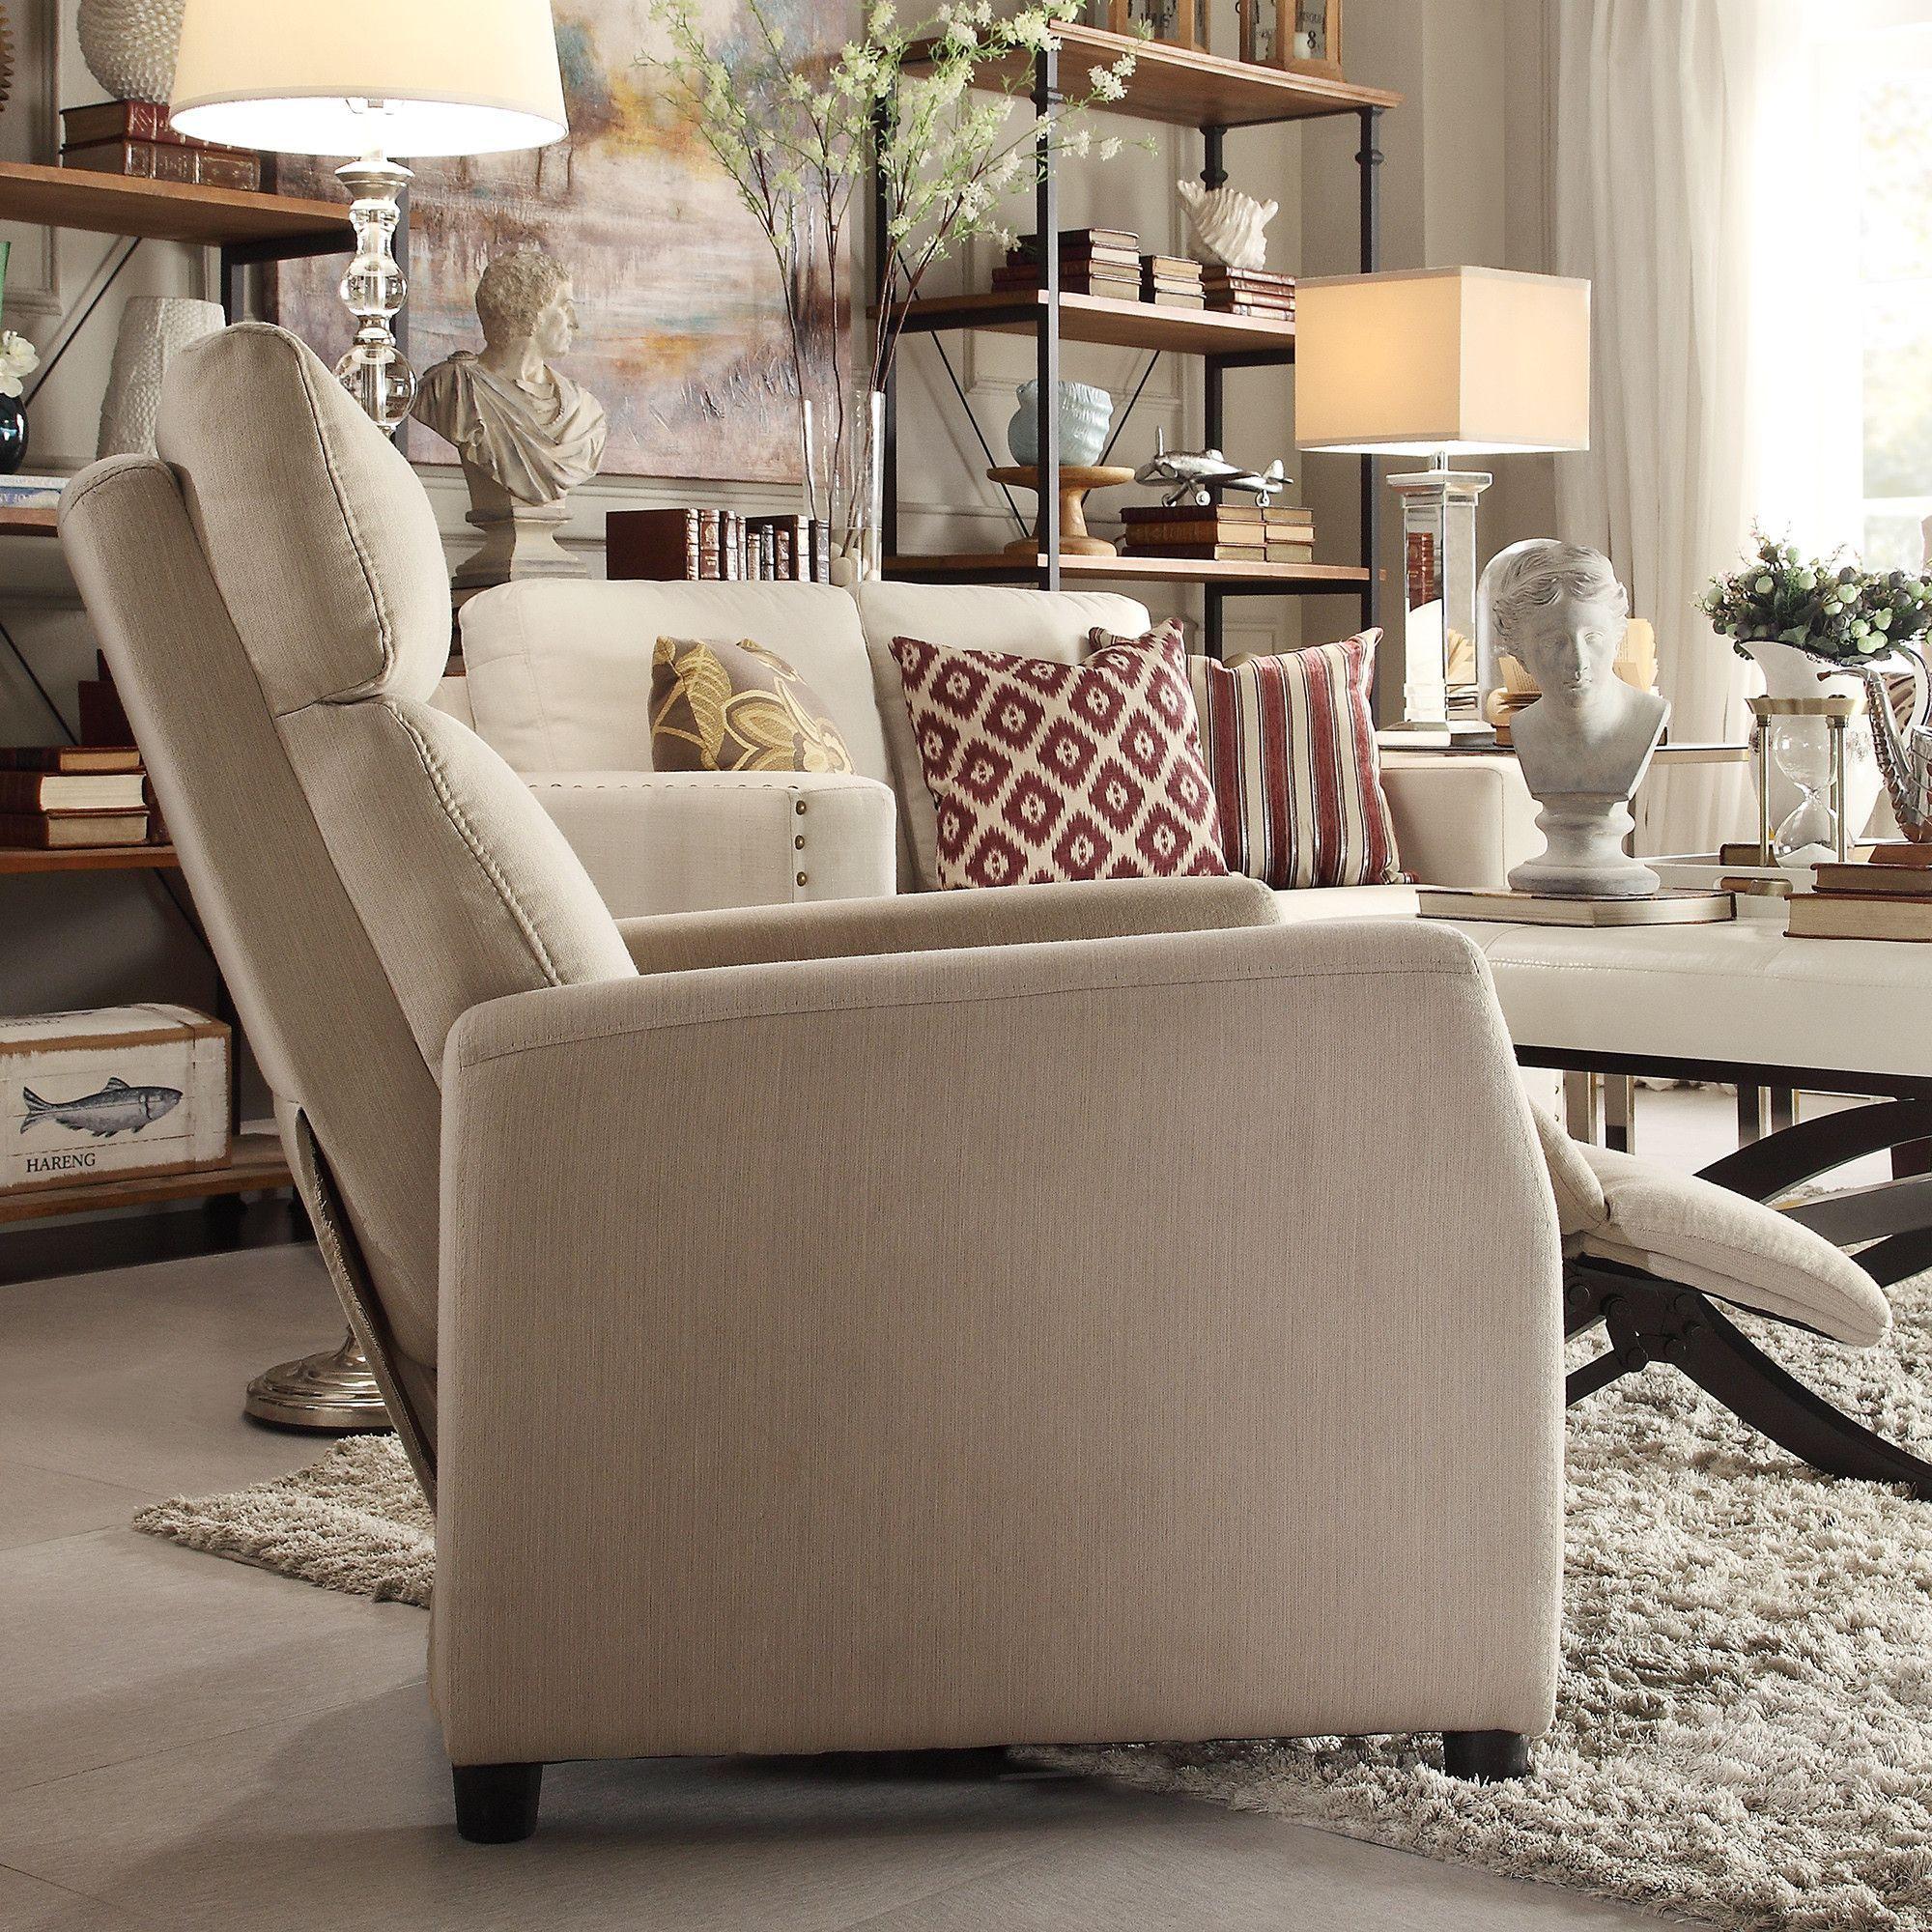 Recliner Recliner, Lounge furniture, Lounge